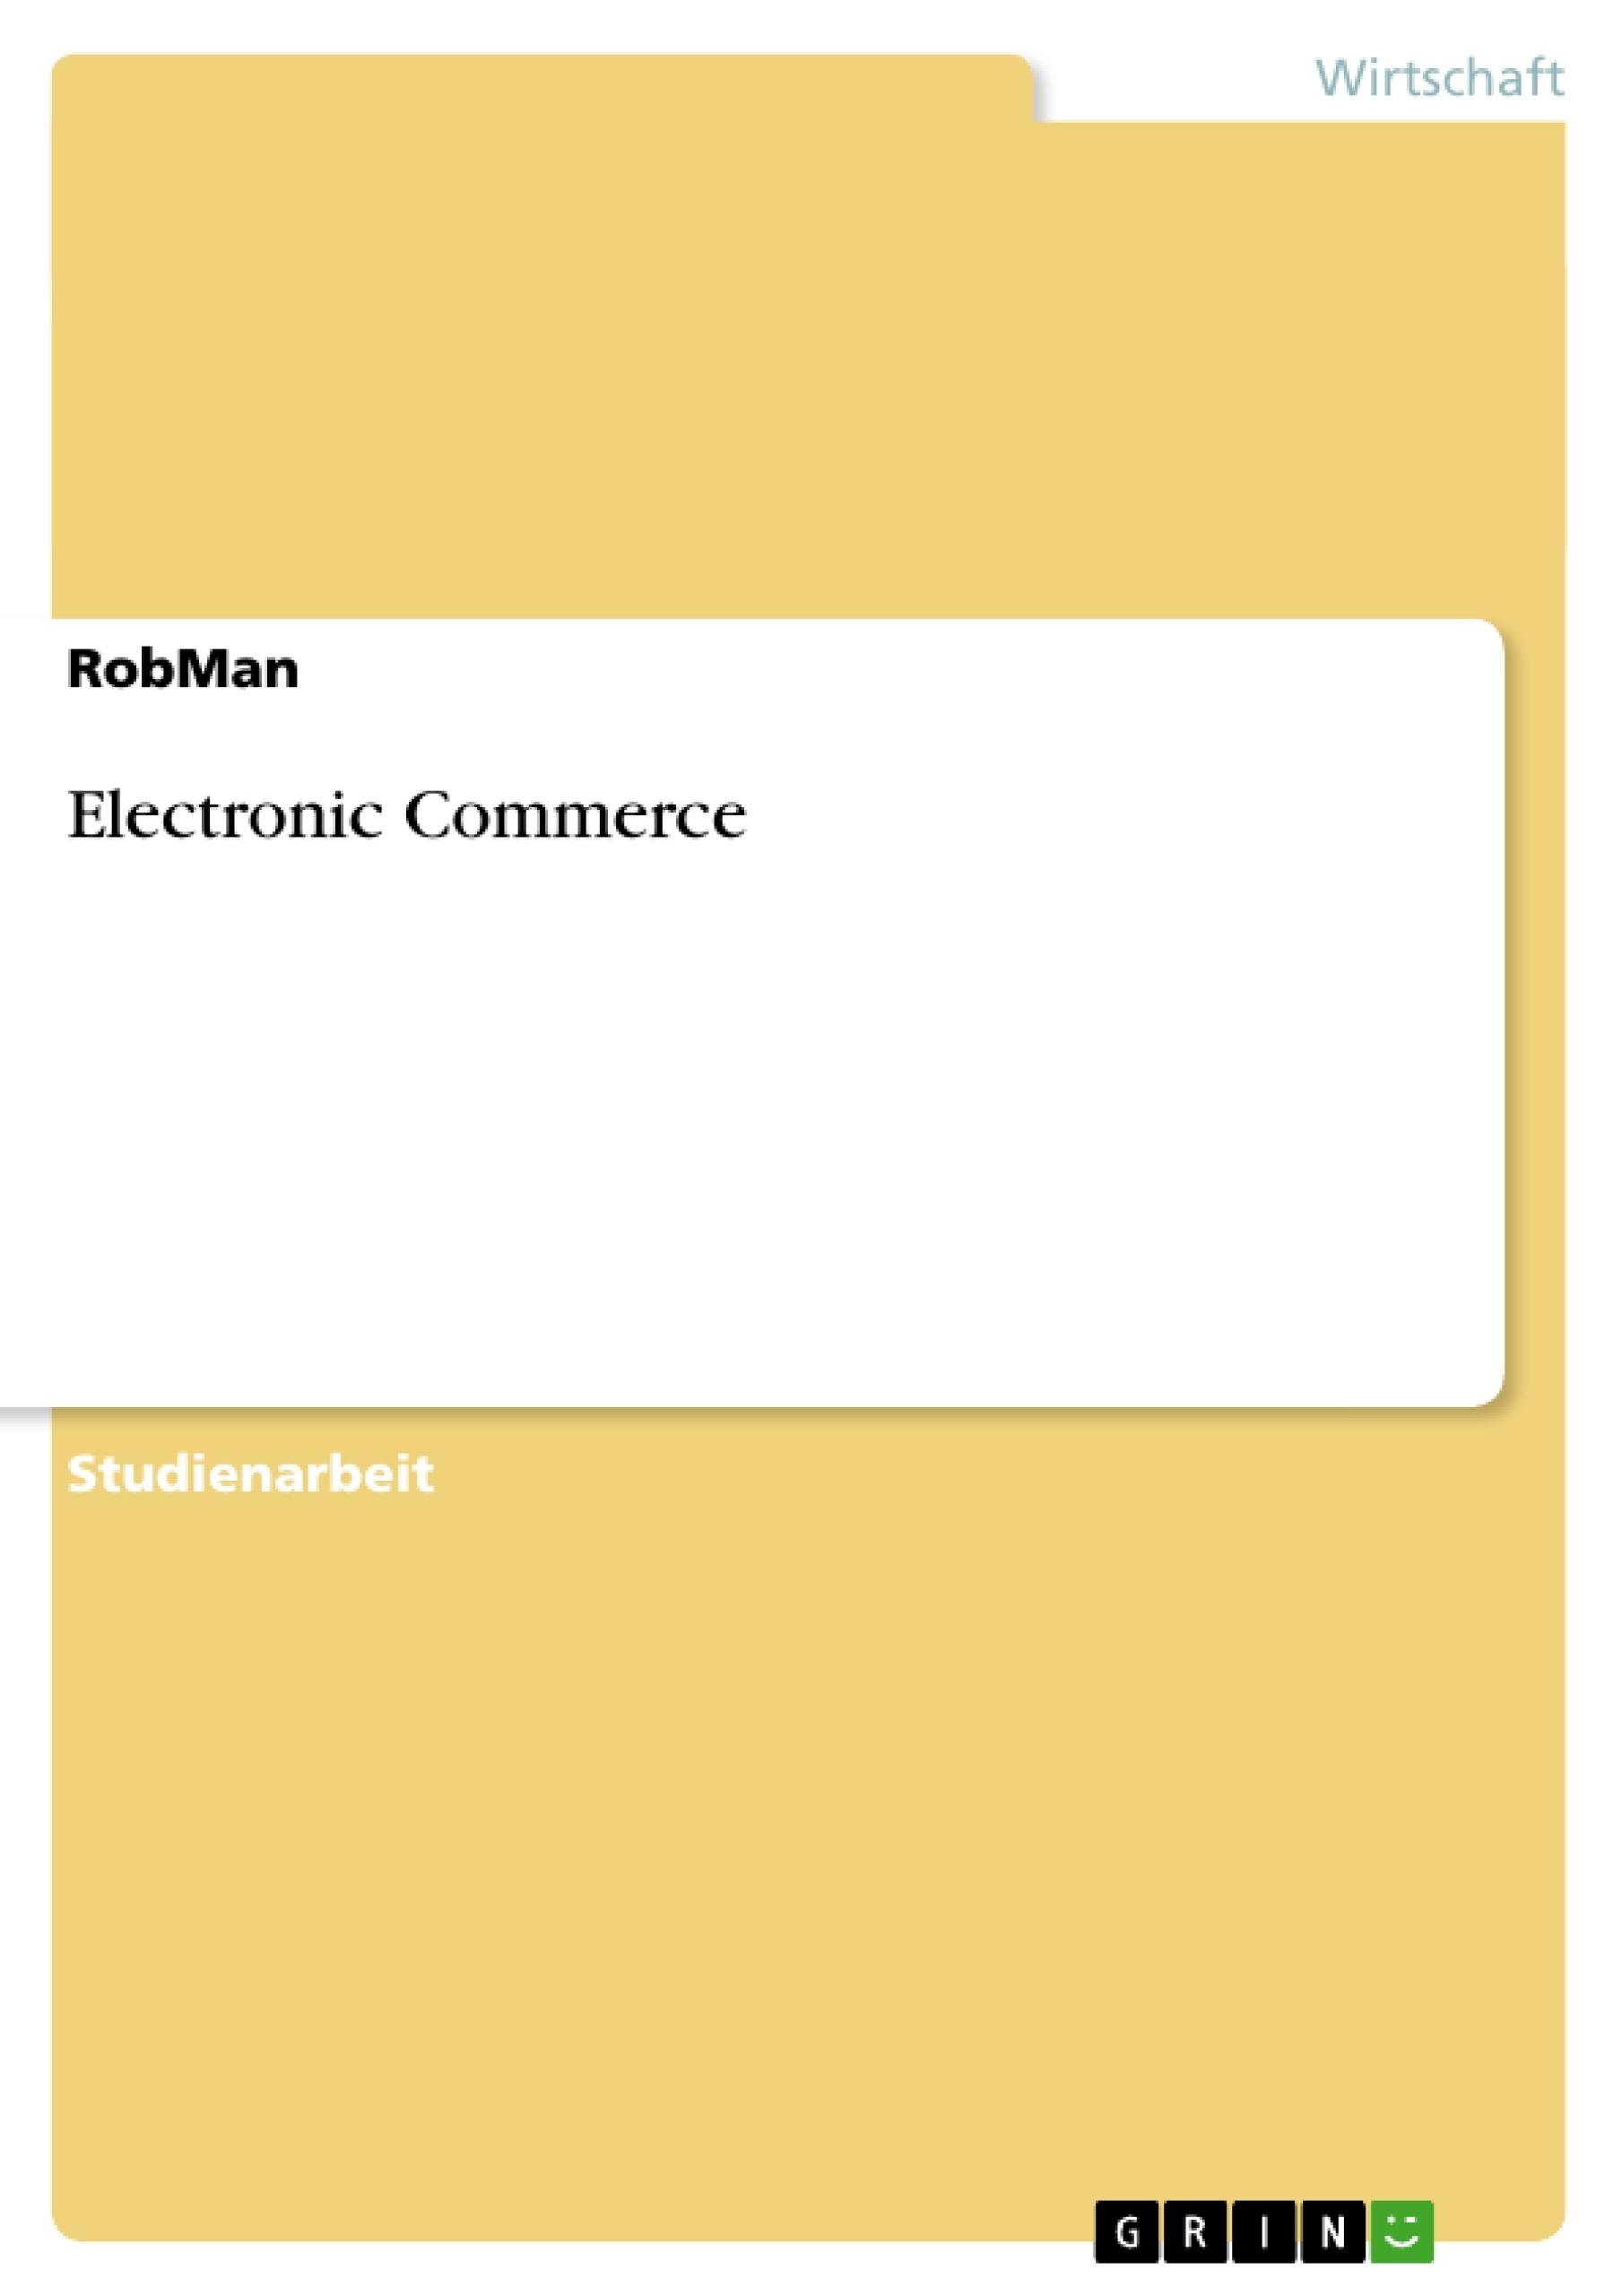 Titel: Electronic Commerce